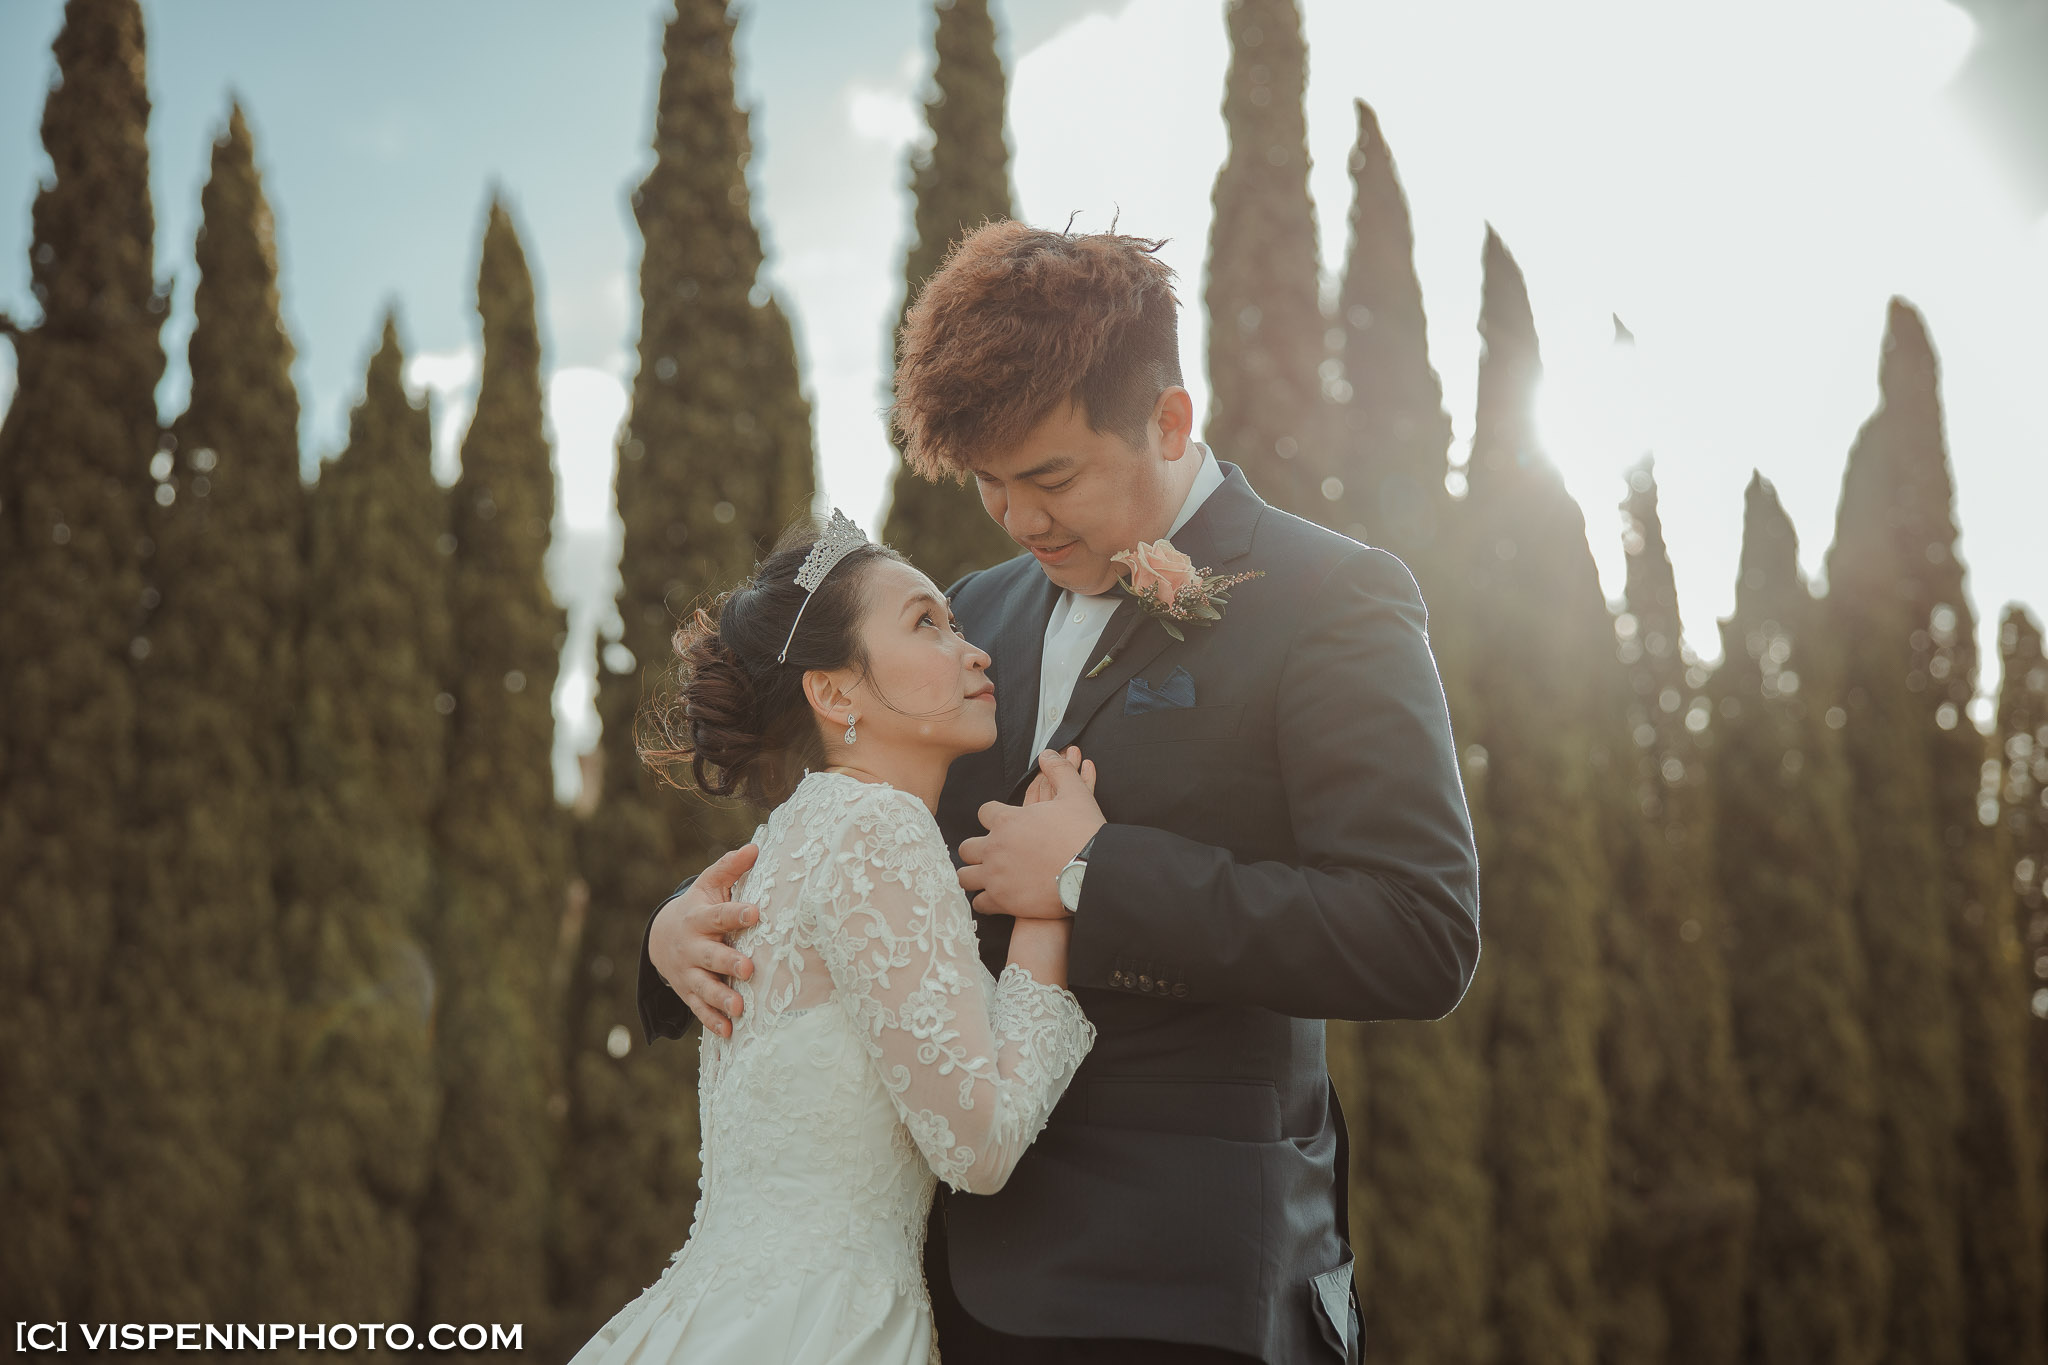 WEDDING DAY Photography Melbourne CoreyCoco 1P 02935 EOSR ZHPENN